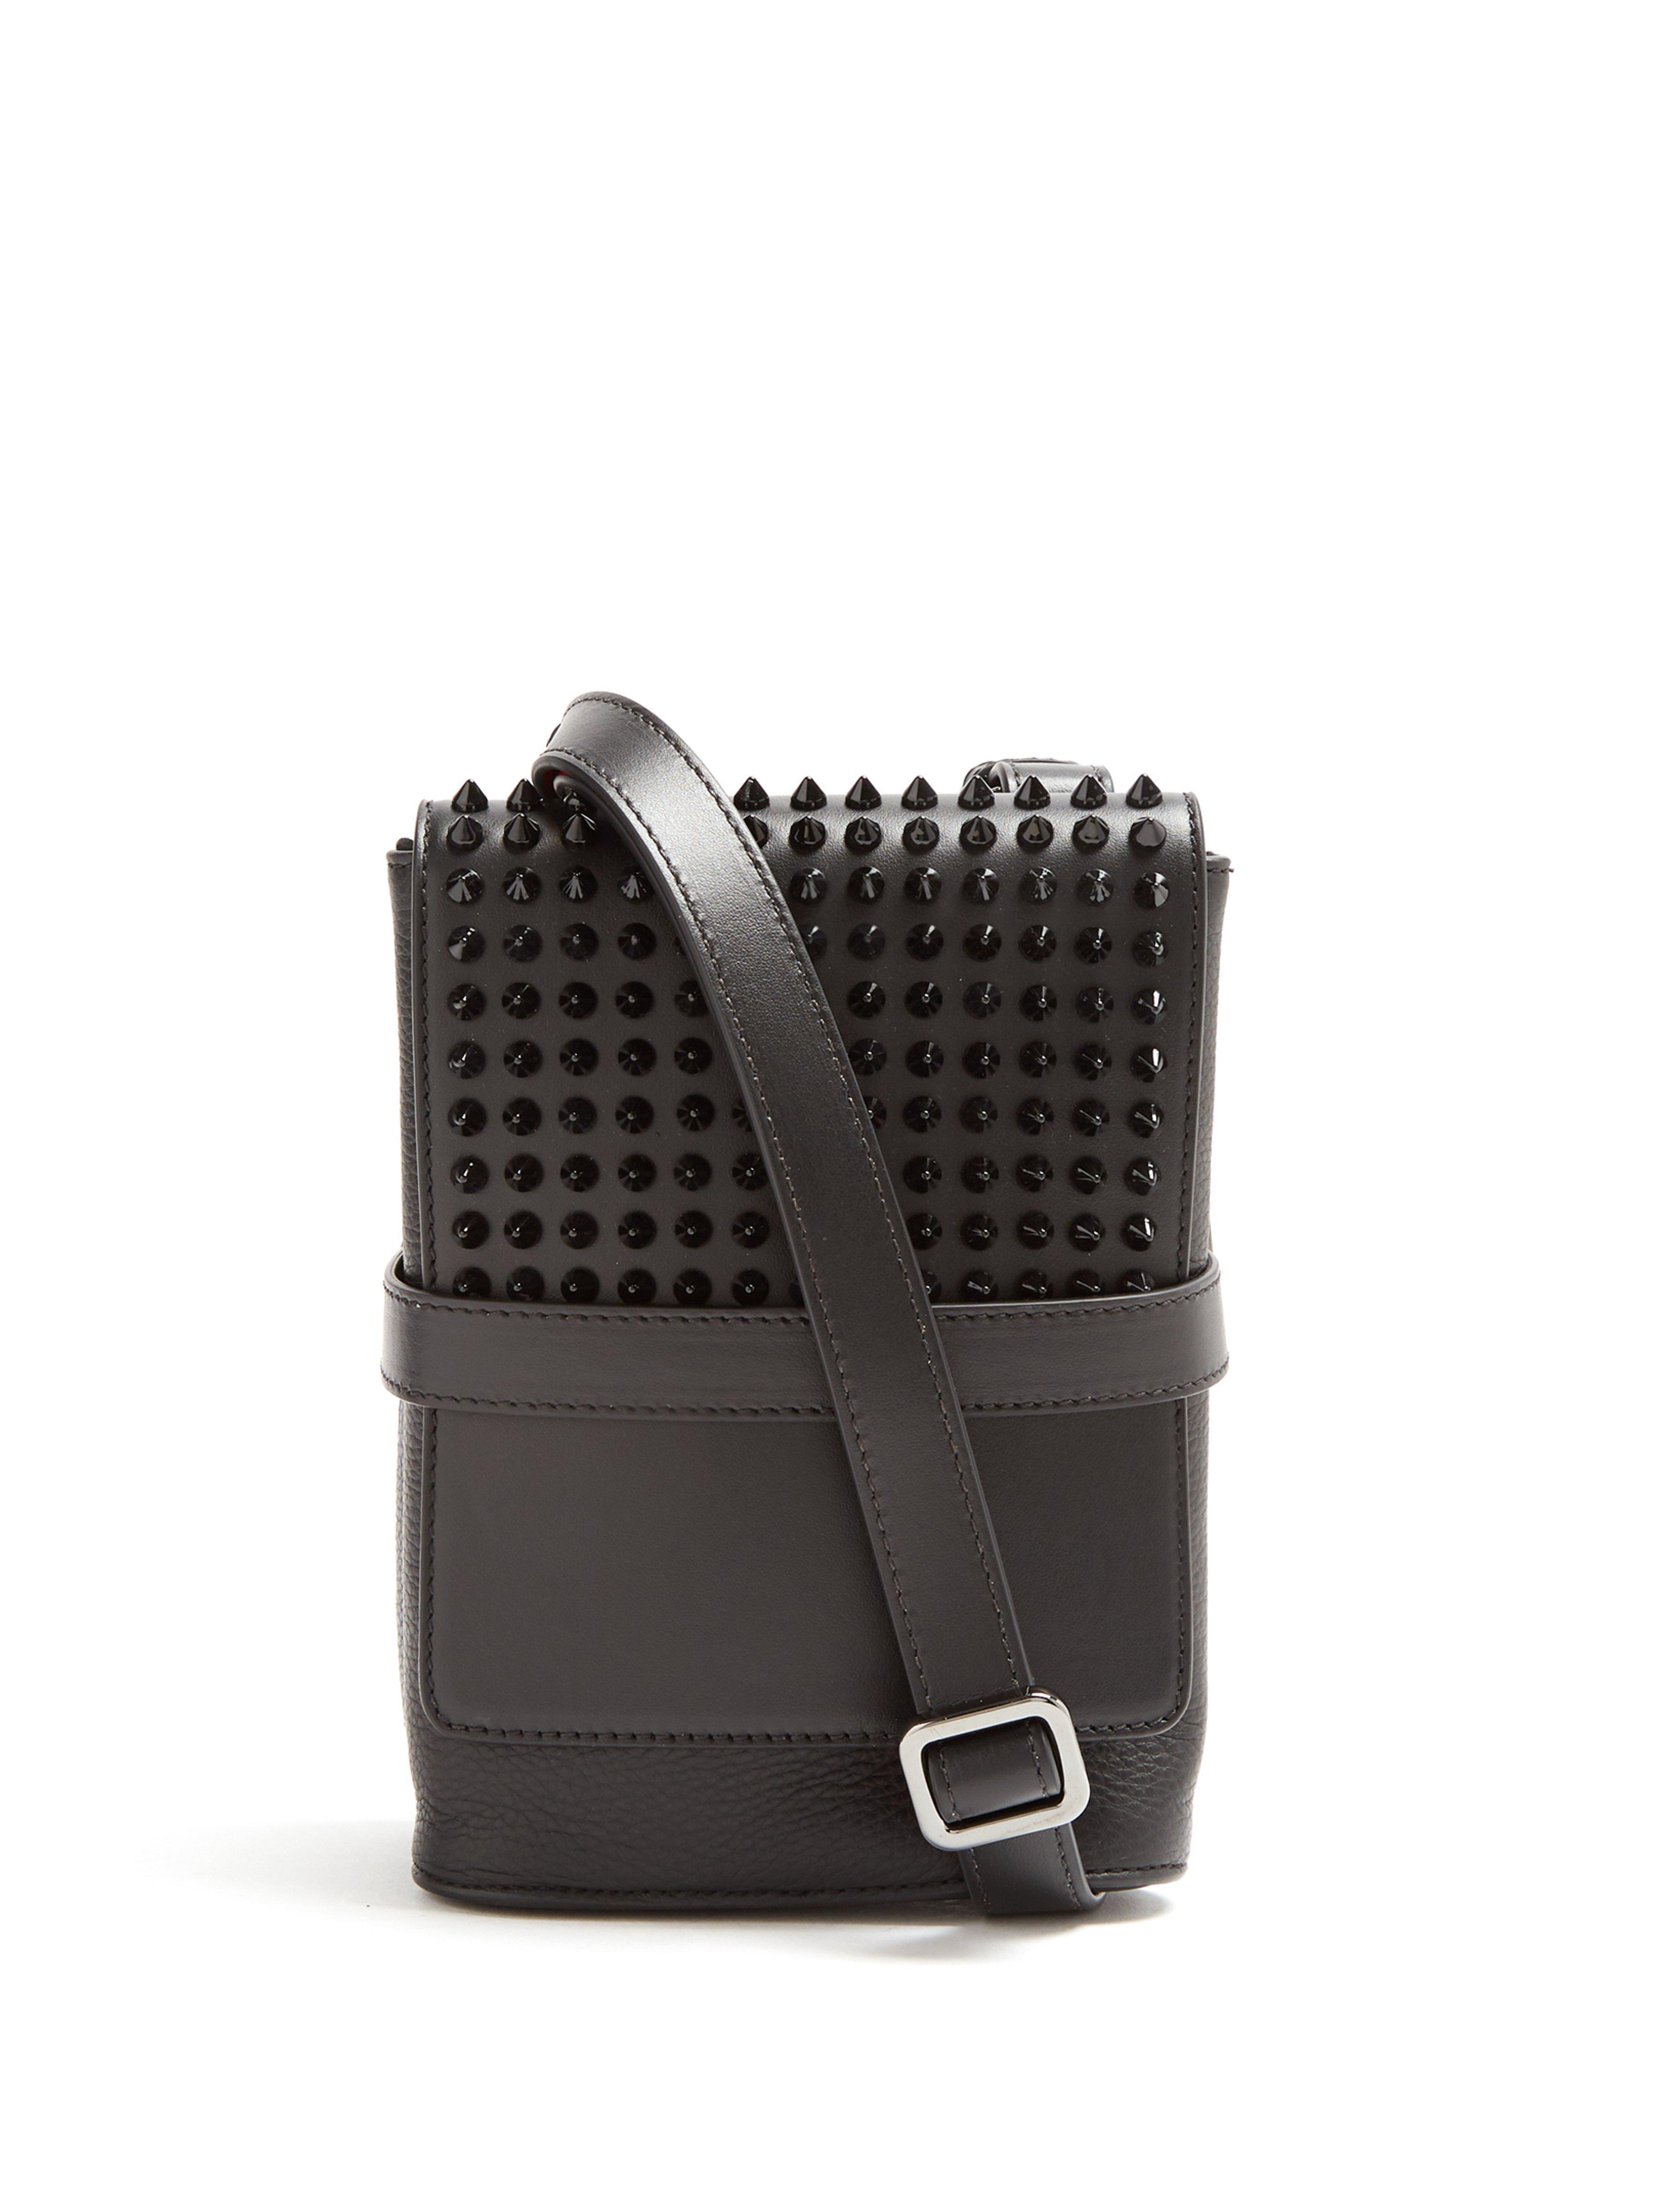 Christian Louboutin. Men s Benech Small Spike Embellished Cross Body Bag c079430c5cd44